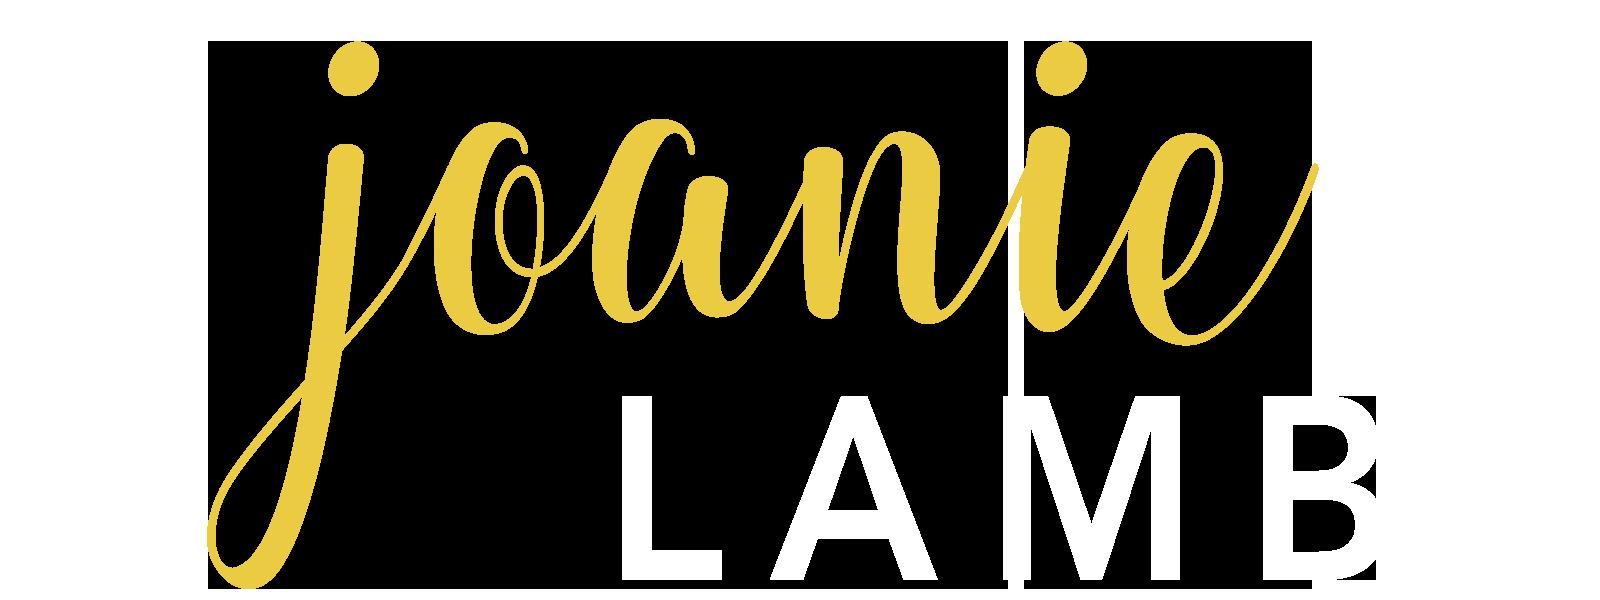 joanie lamb logo